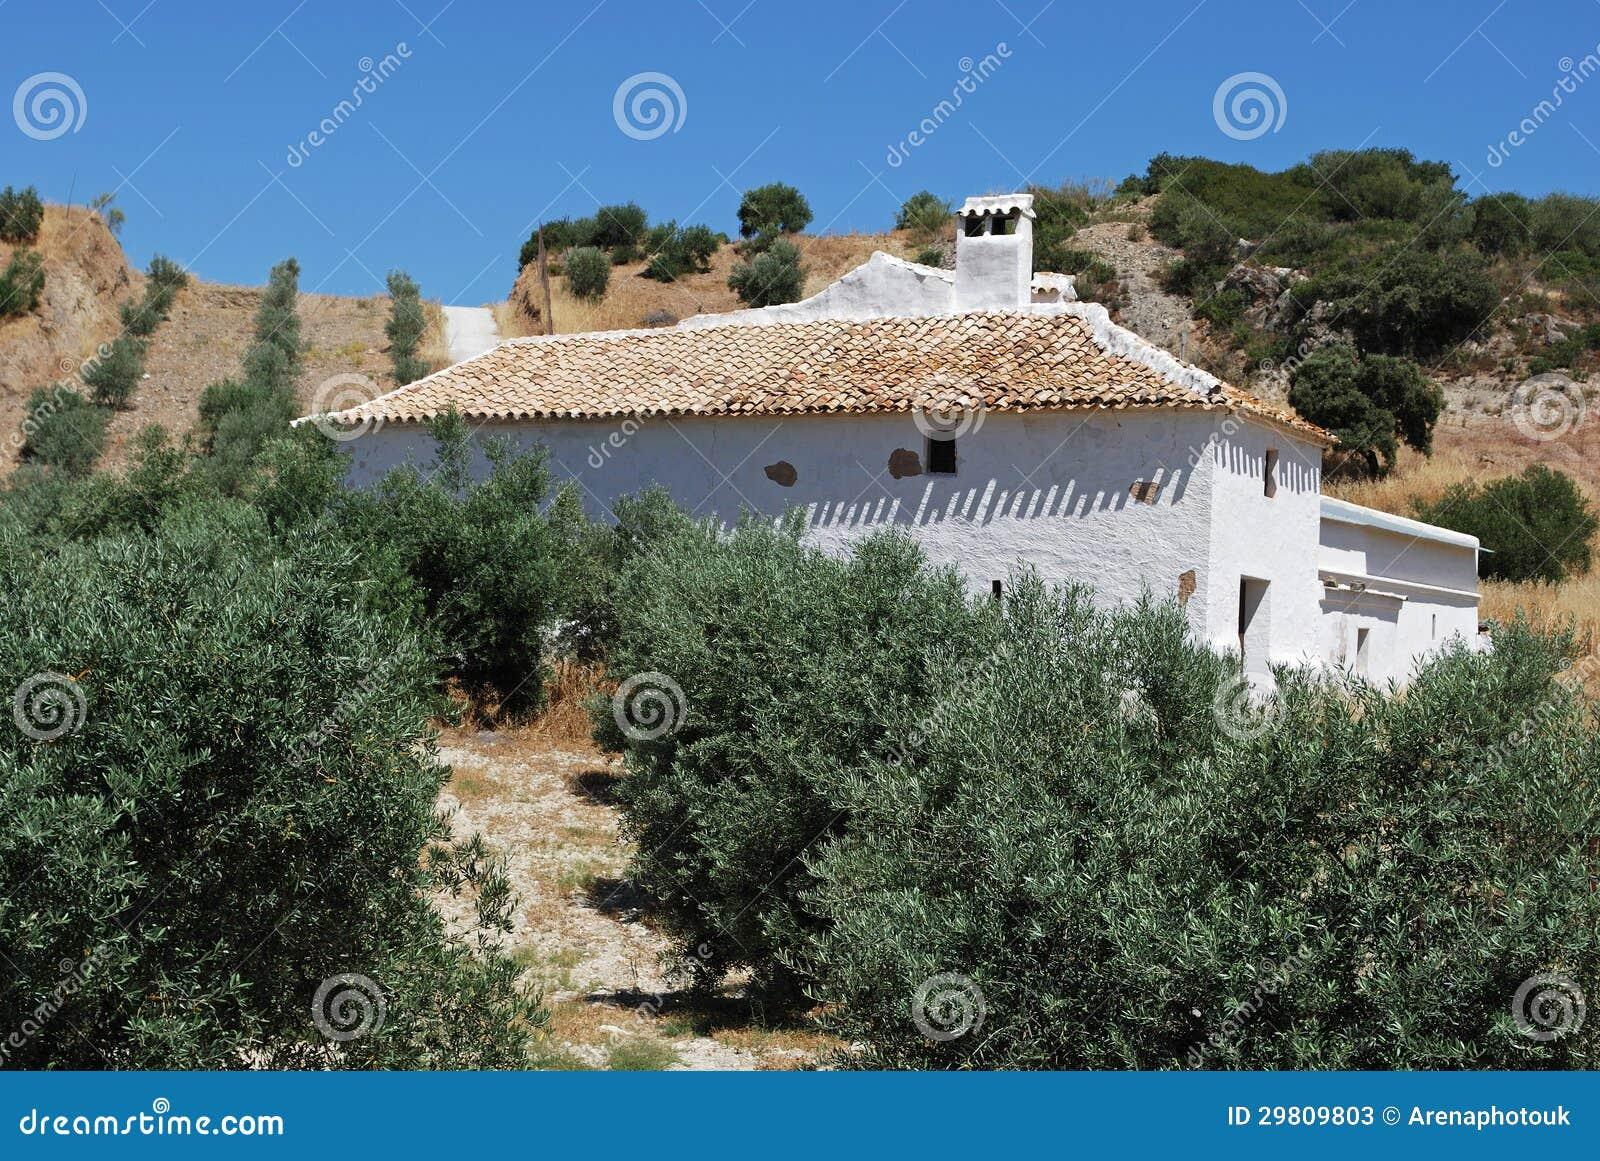 Lantbrukarhem- och olivdunge, Olvera, Spanien.